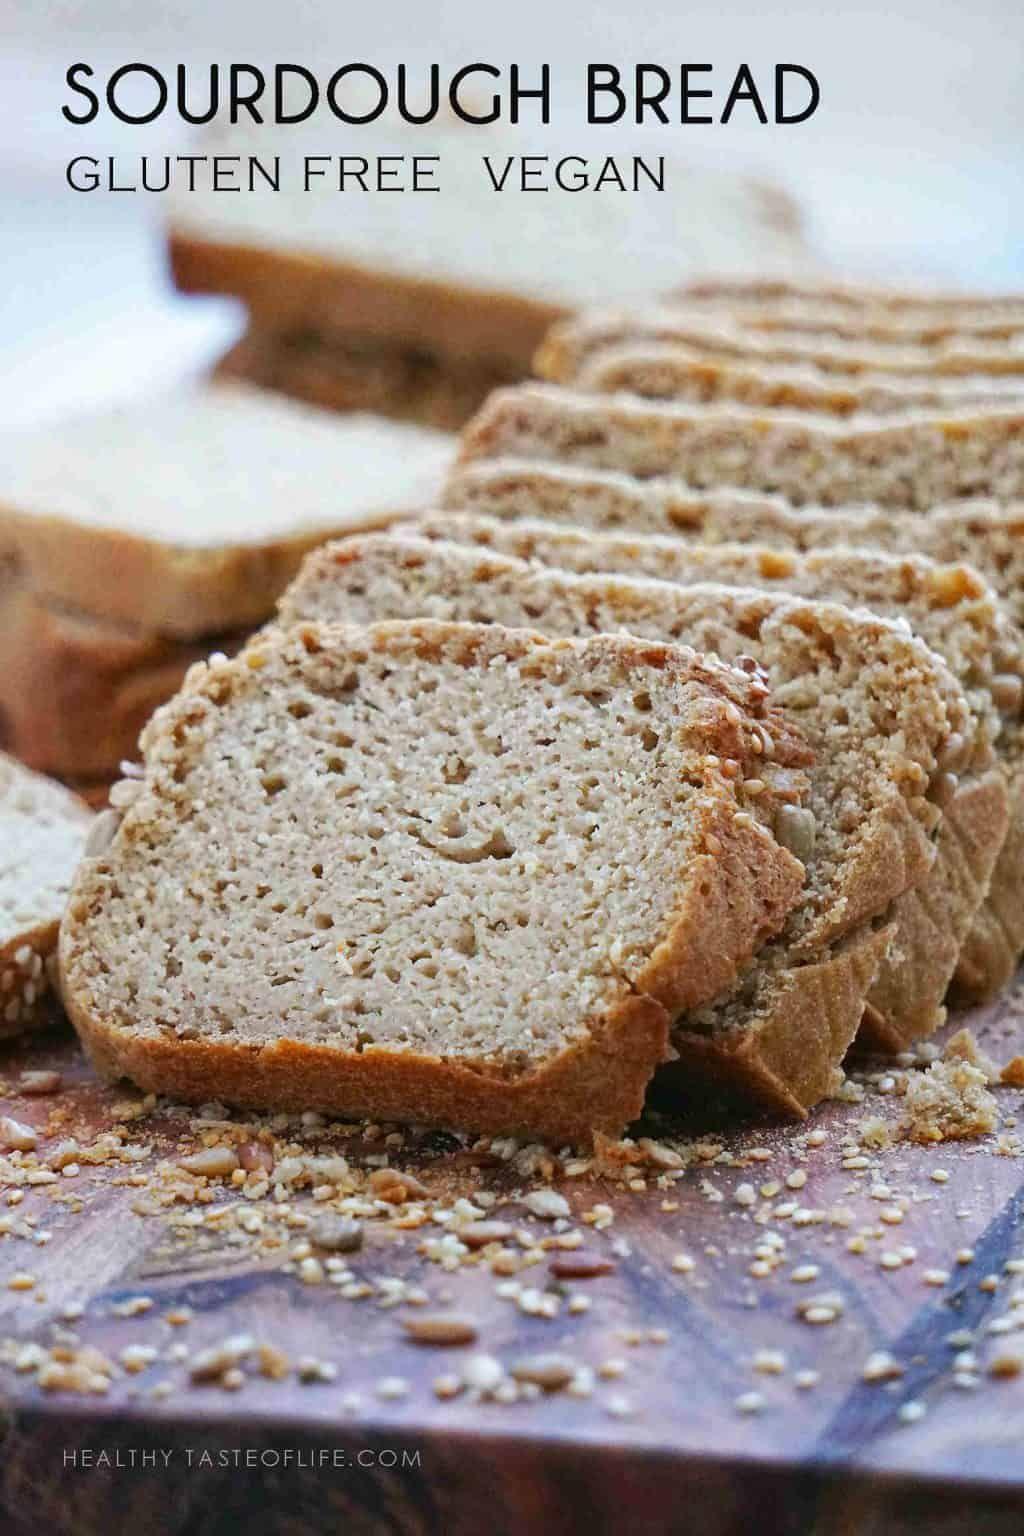 Vegan Gluten Free Sourdough Bread Recipe, Yeast Free, Gum ...